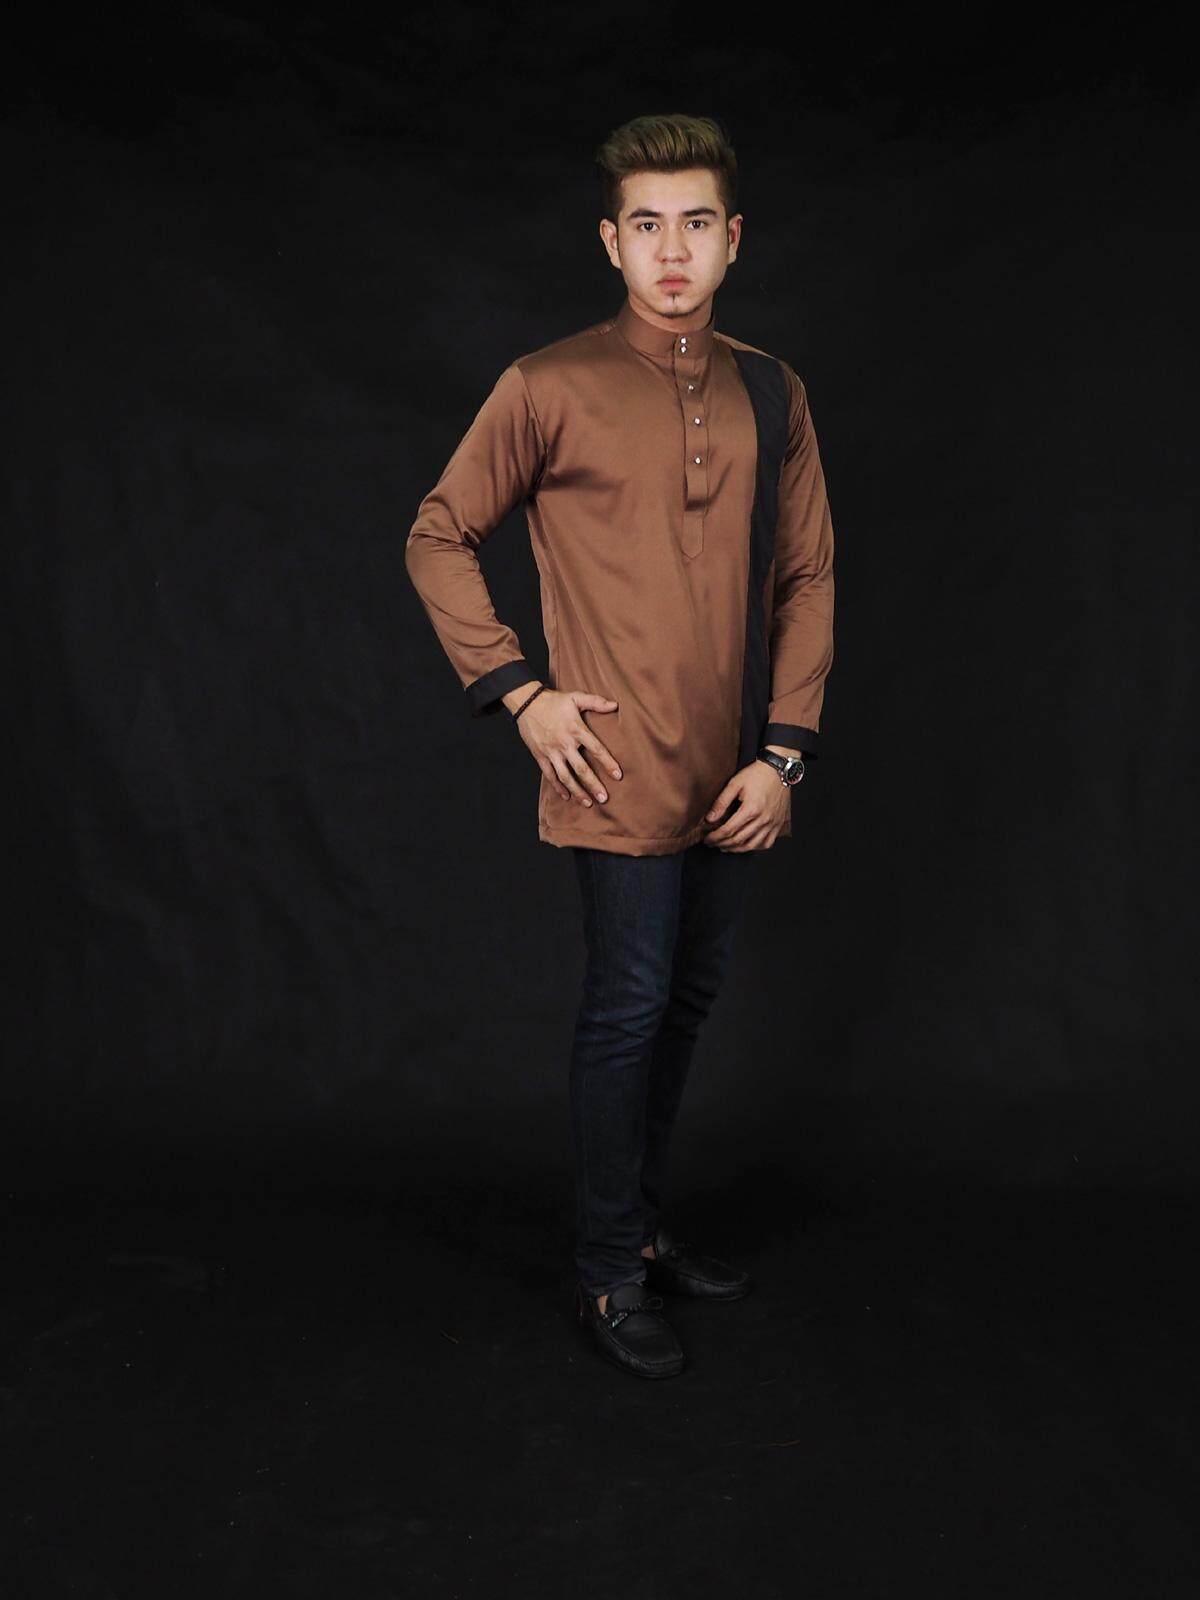 Yuso Satin Kurta / Muslim Men Fashion Trendy Modern Satin Kurta (S-5XL)